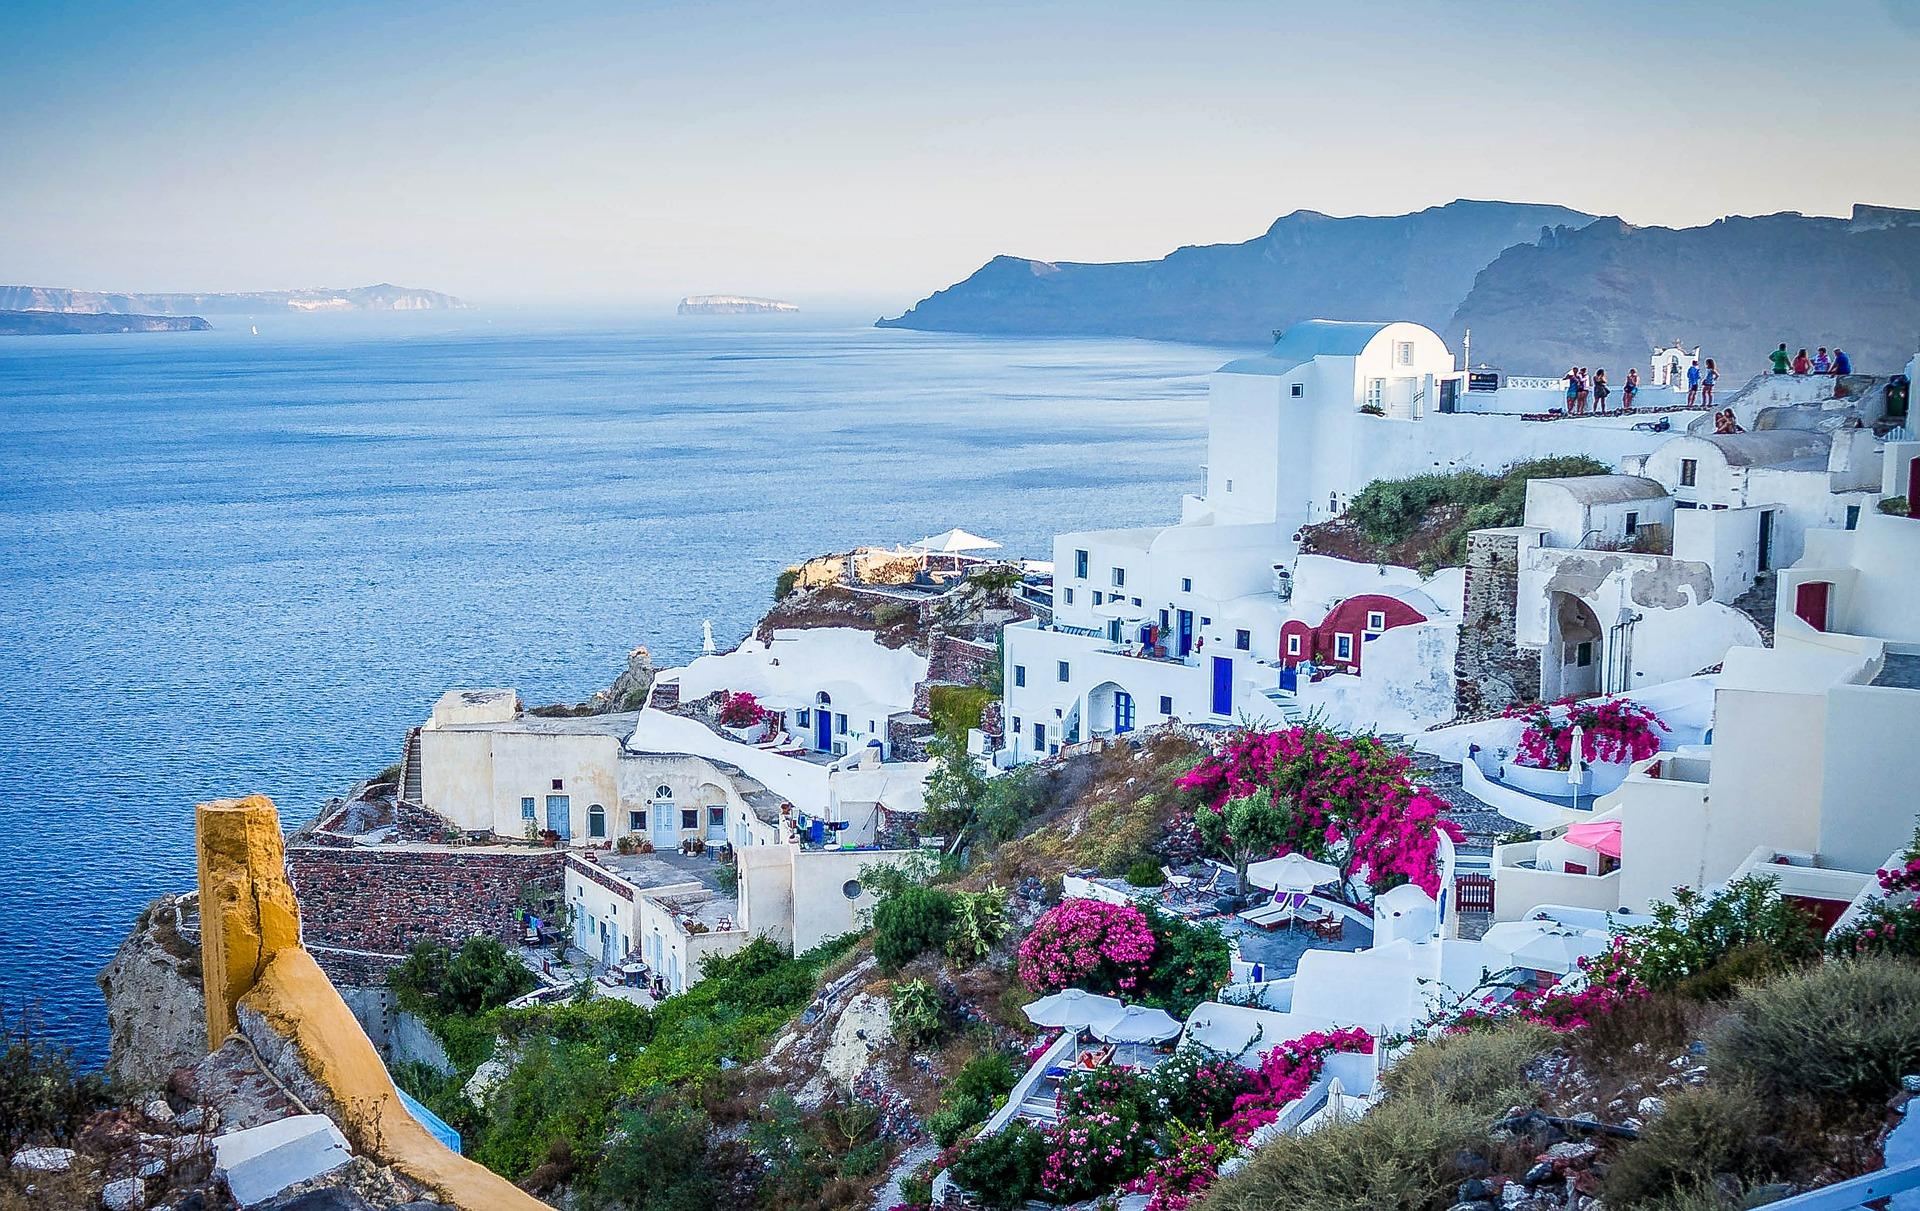 ツ Gunstige Urlaubsziele Am Mittelmeer Low Budget Reise De